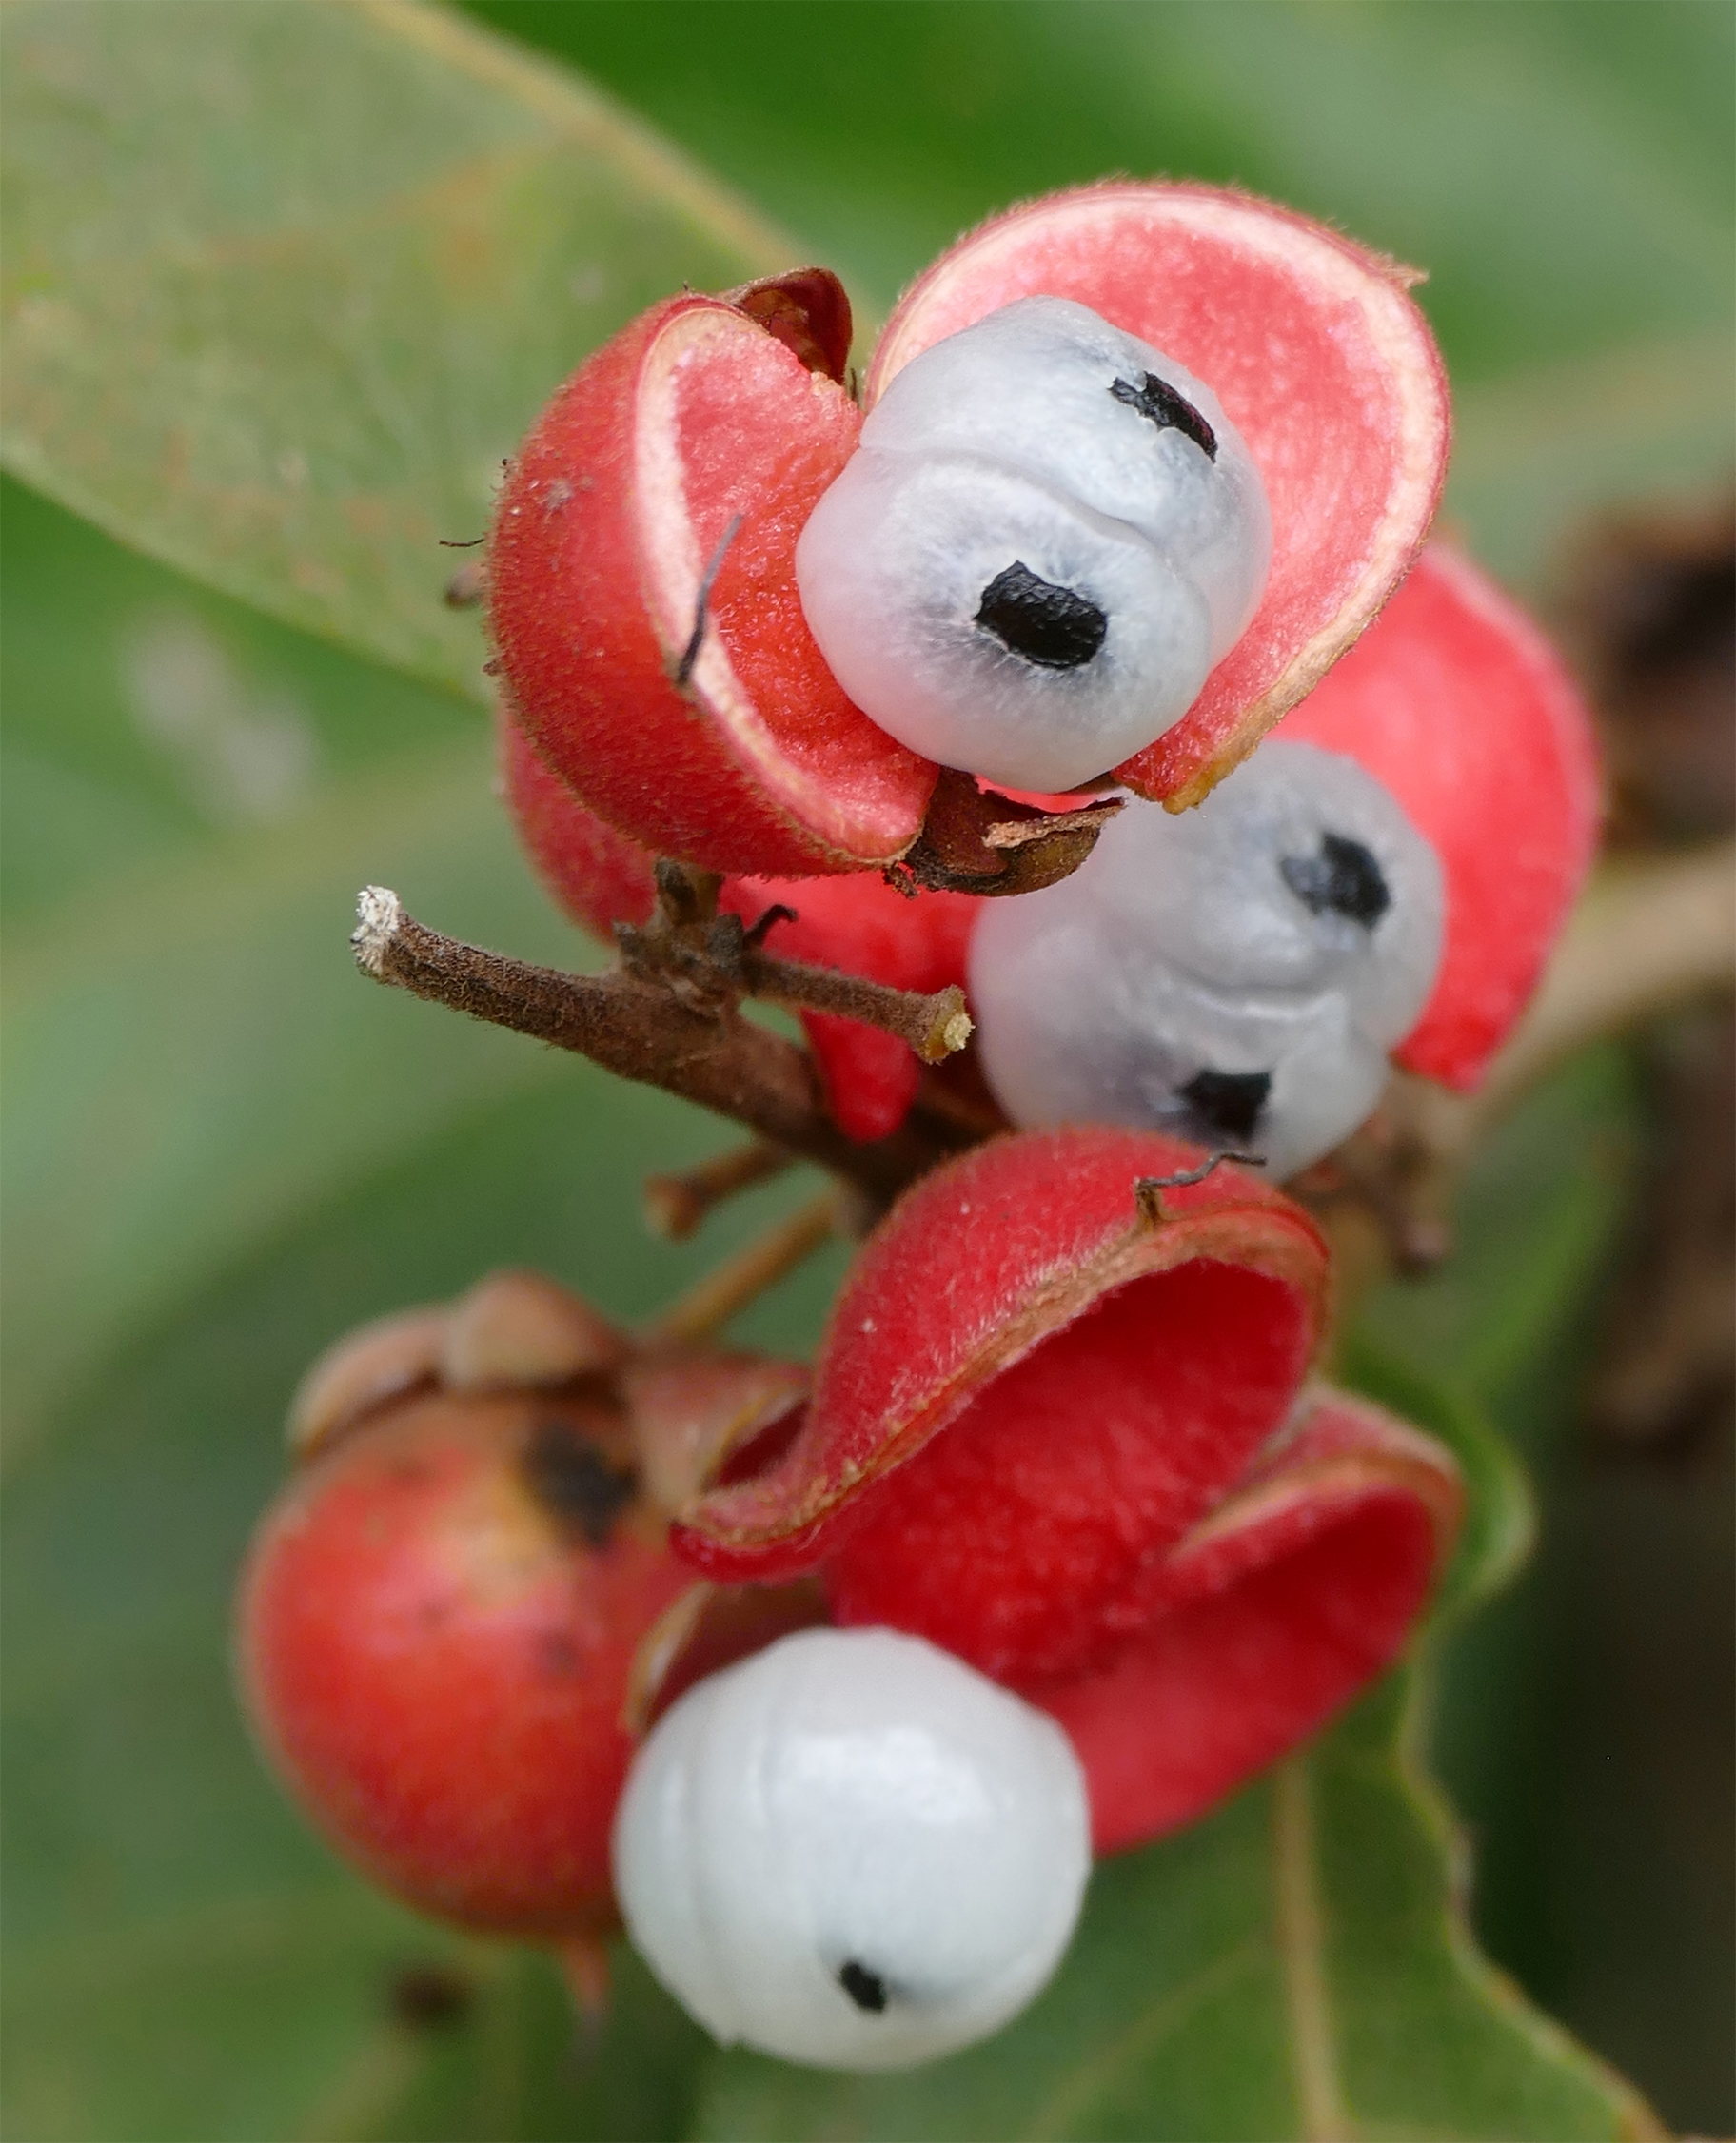 Opened-fruits